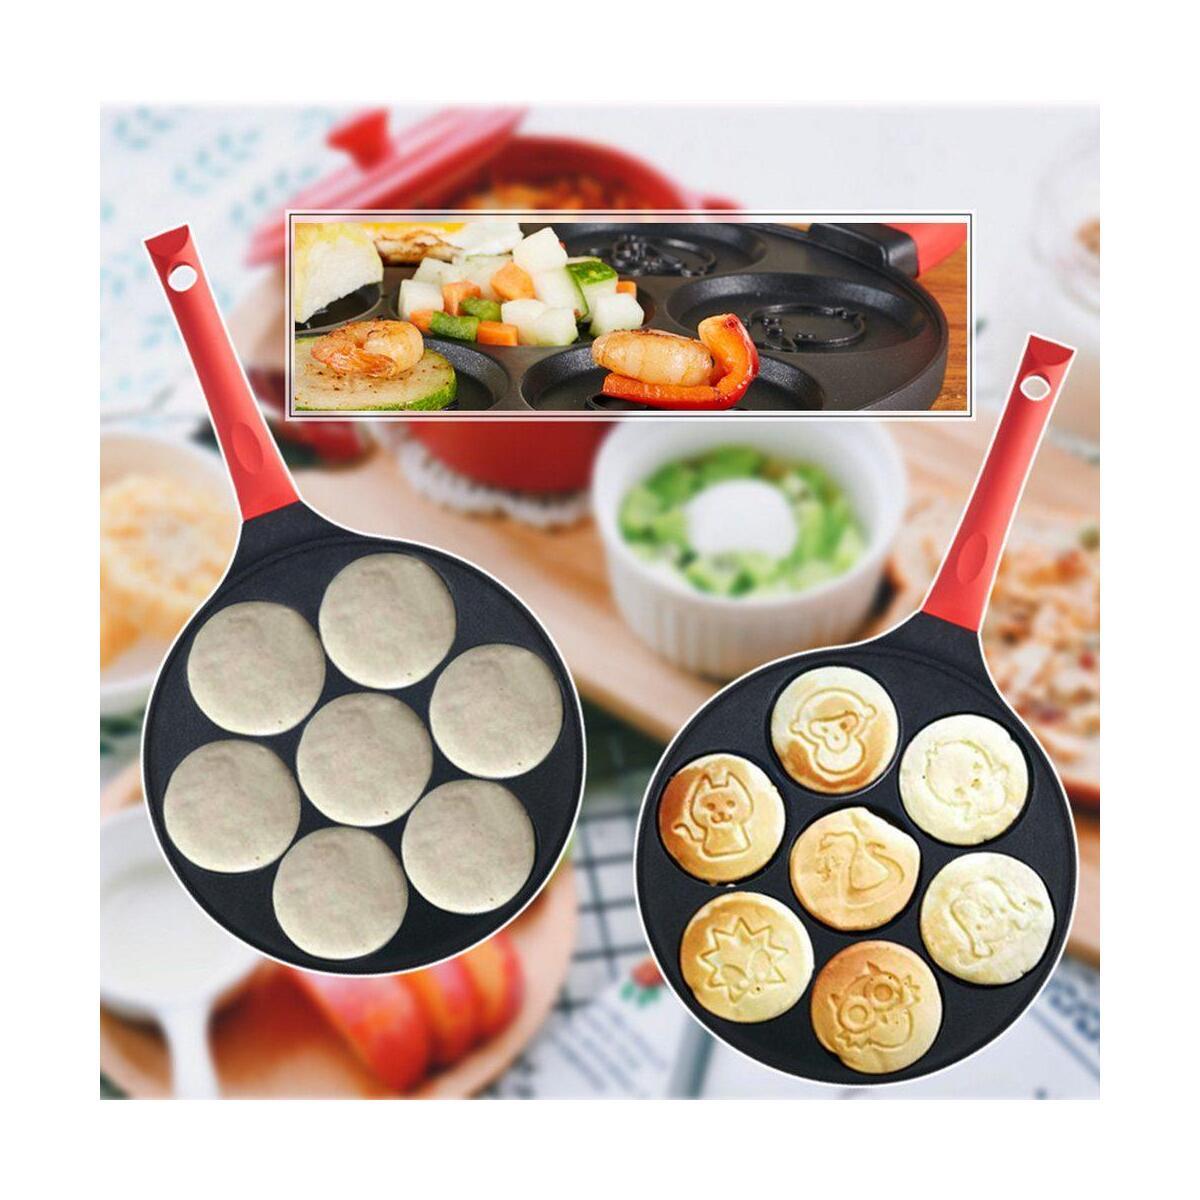 Aluminum Alloy Frying Pan Non-stick Breakfast Pot Fried Smiley Face Animal Mold Pancake Omelette Pan Seven-hole Egg Pot